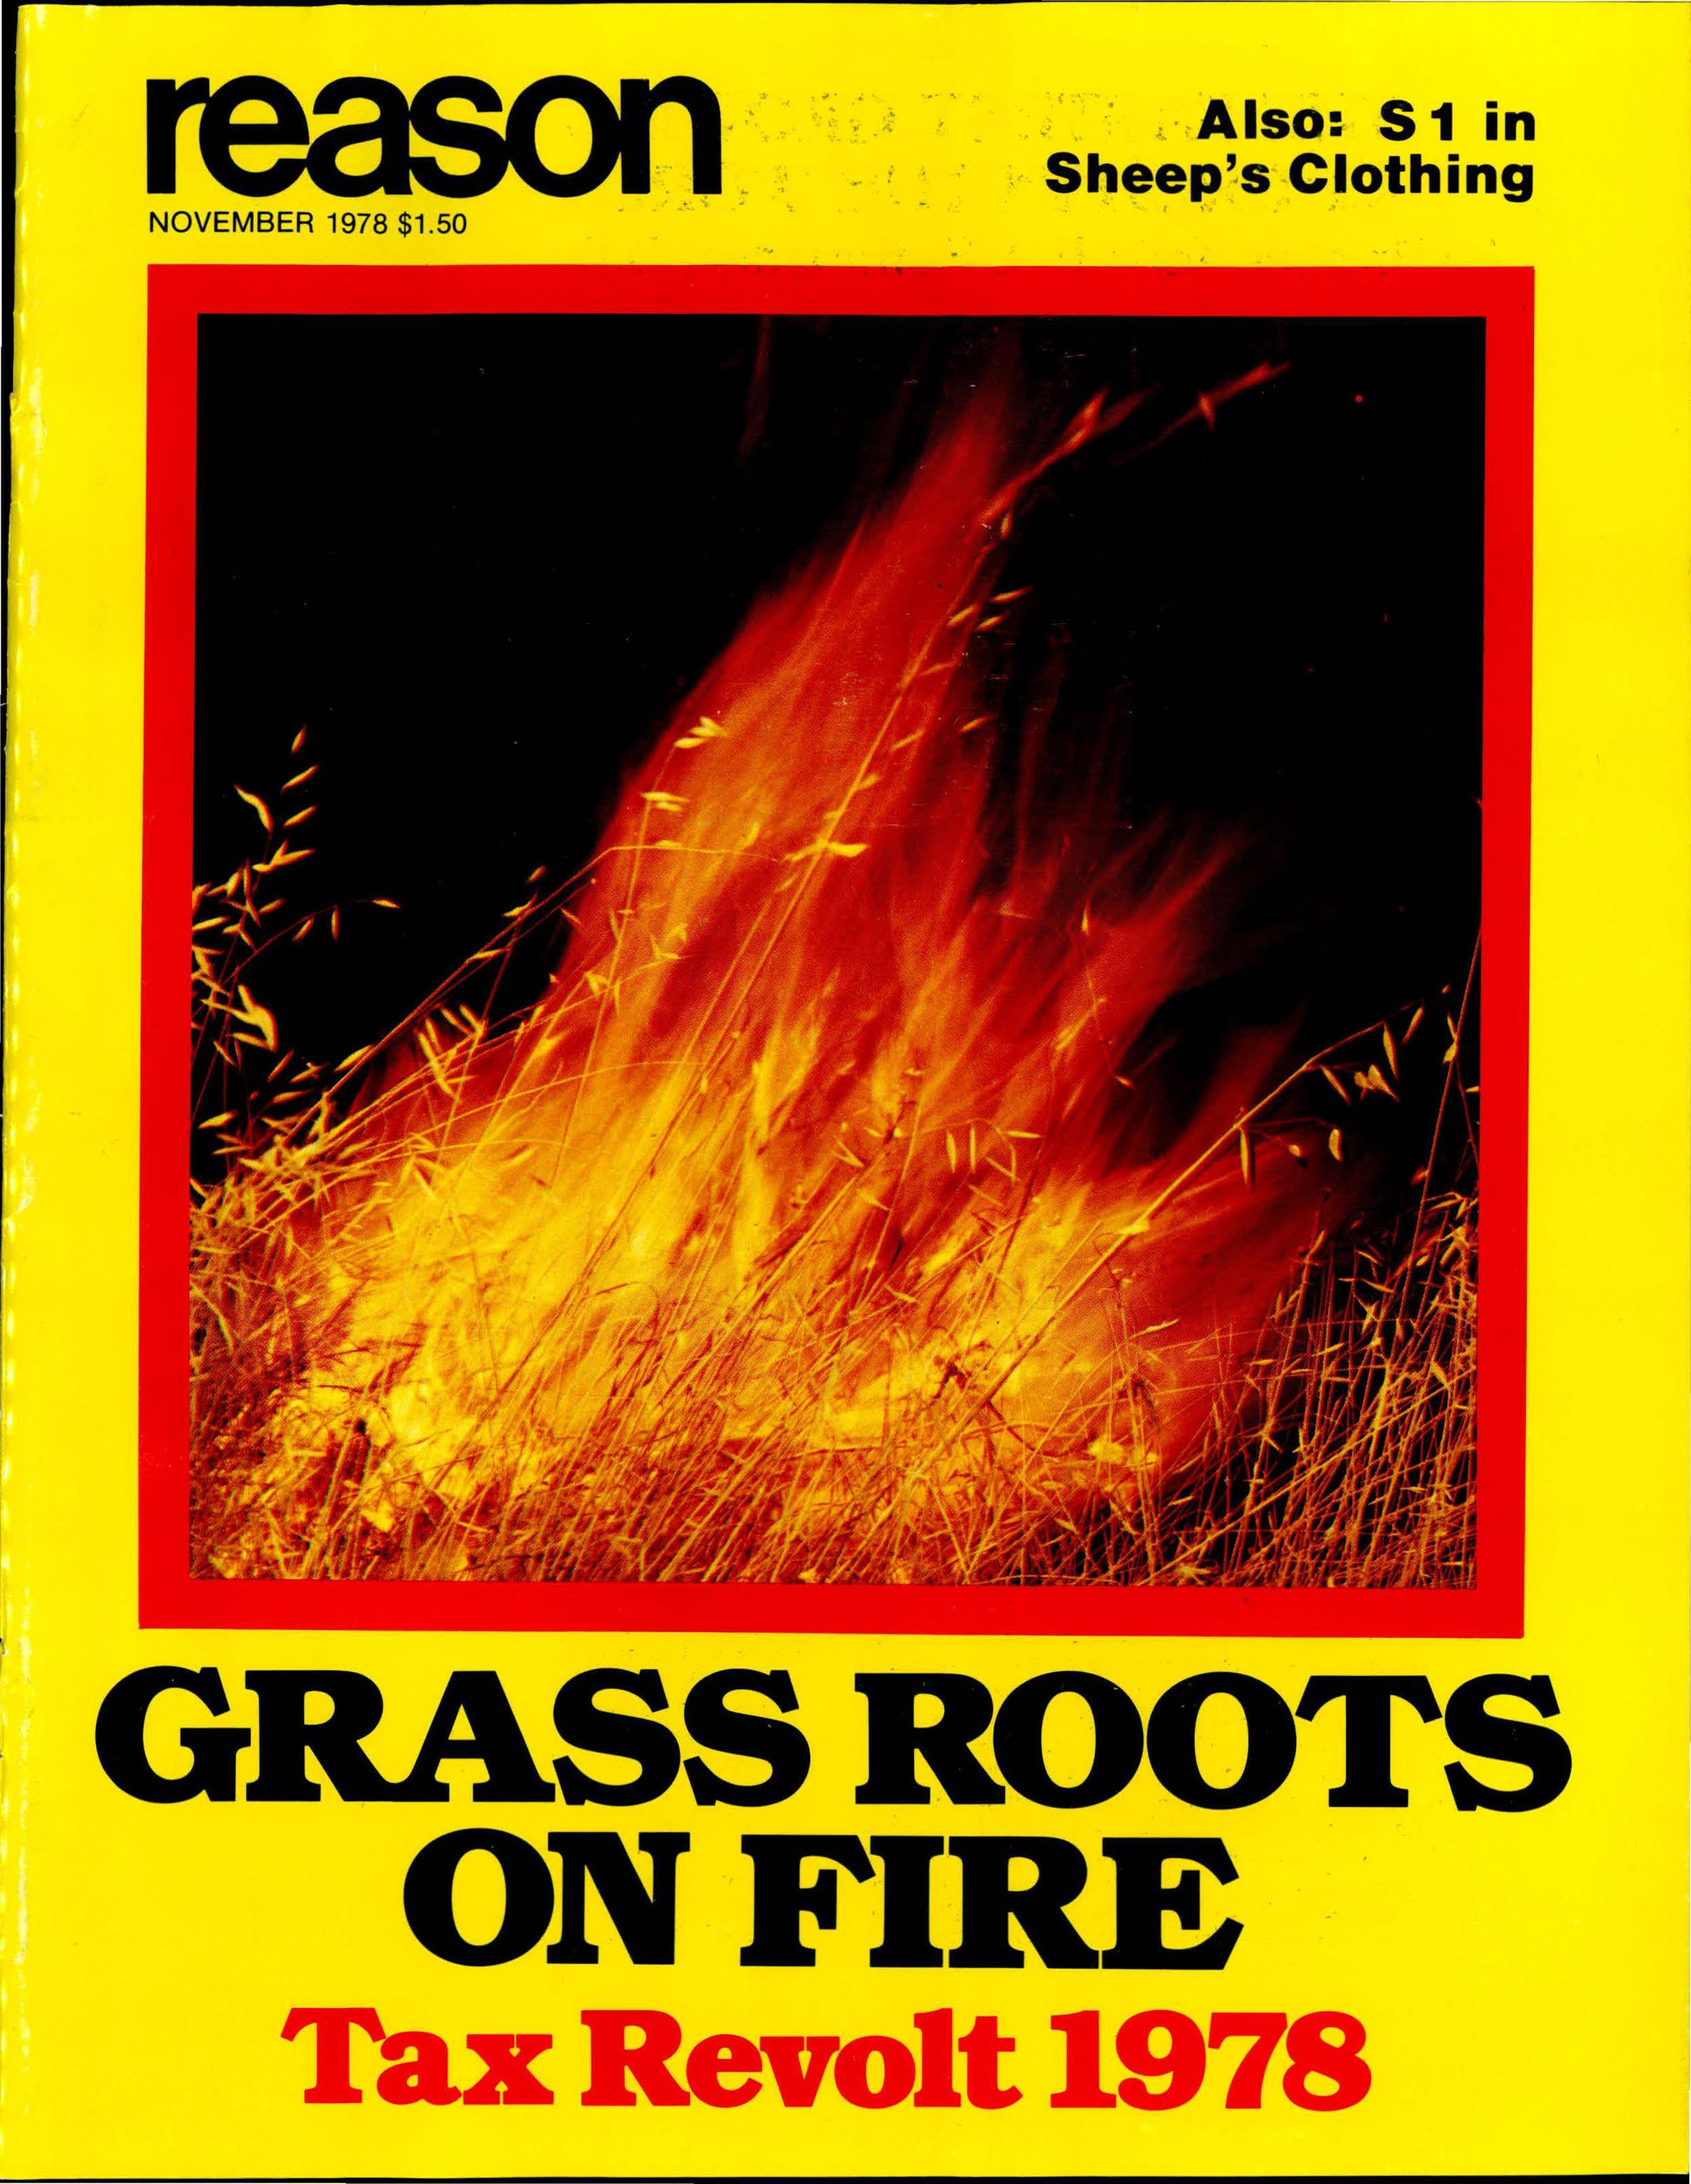 Reason Magazine, November 1978 cover image